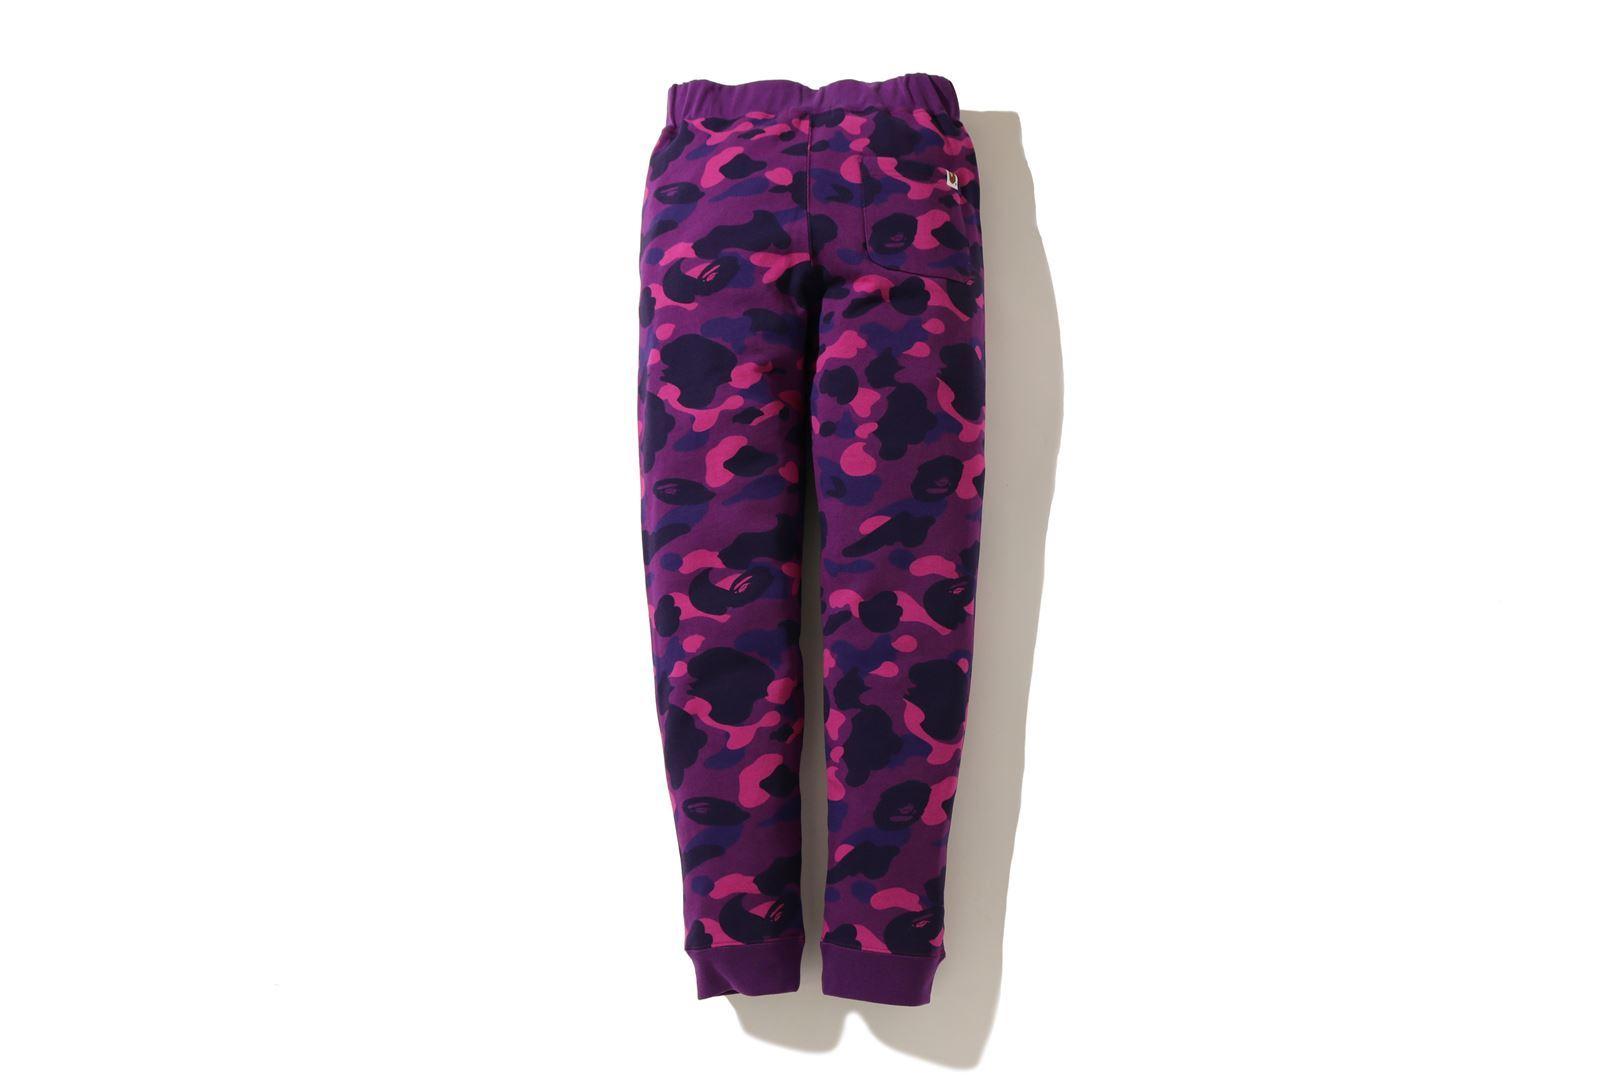 COLOR CAMO TIGER SLIM SWEAT PANTS_a0174495_13505009.jpg